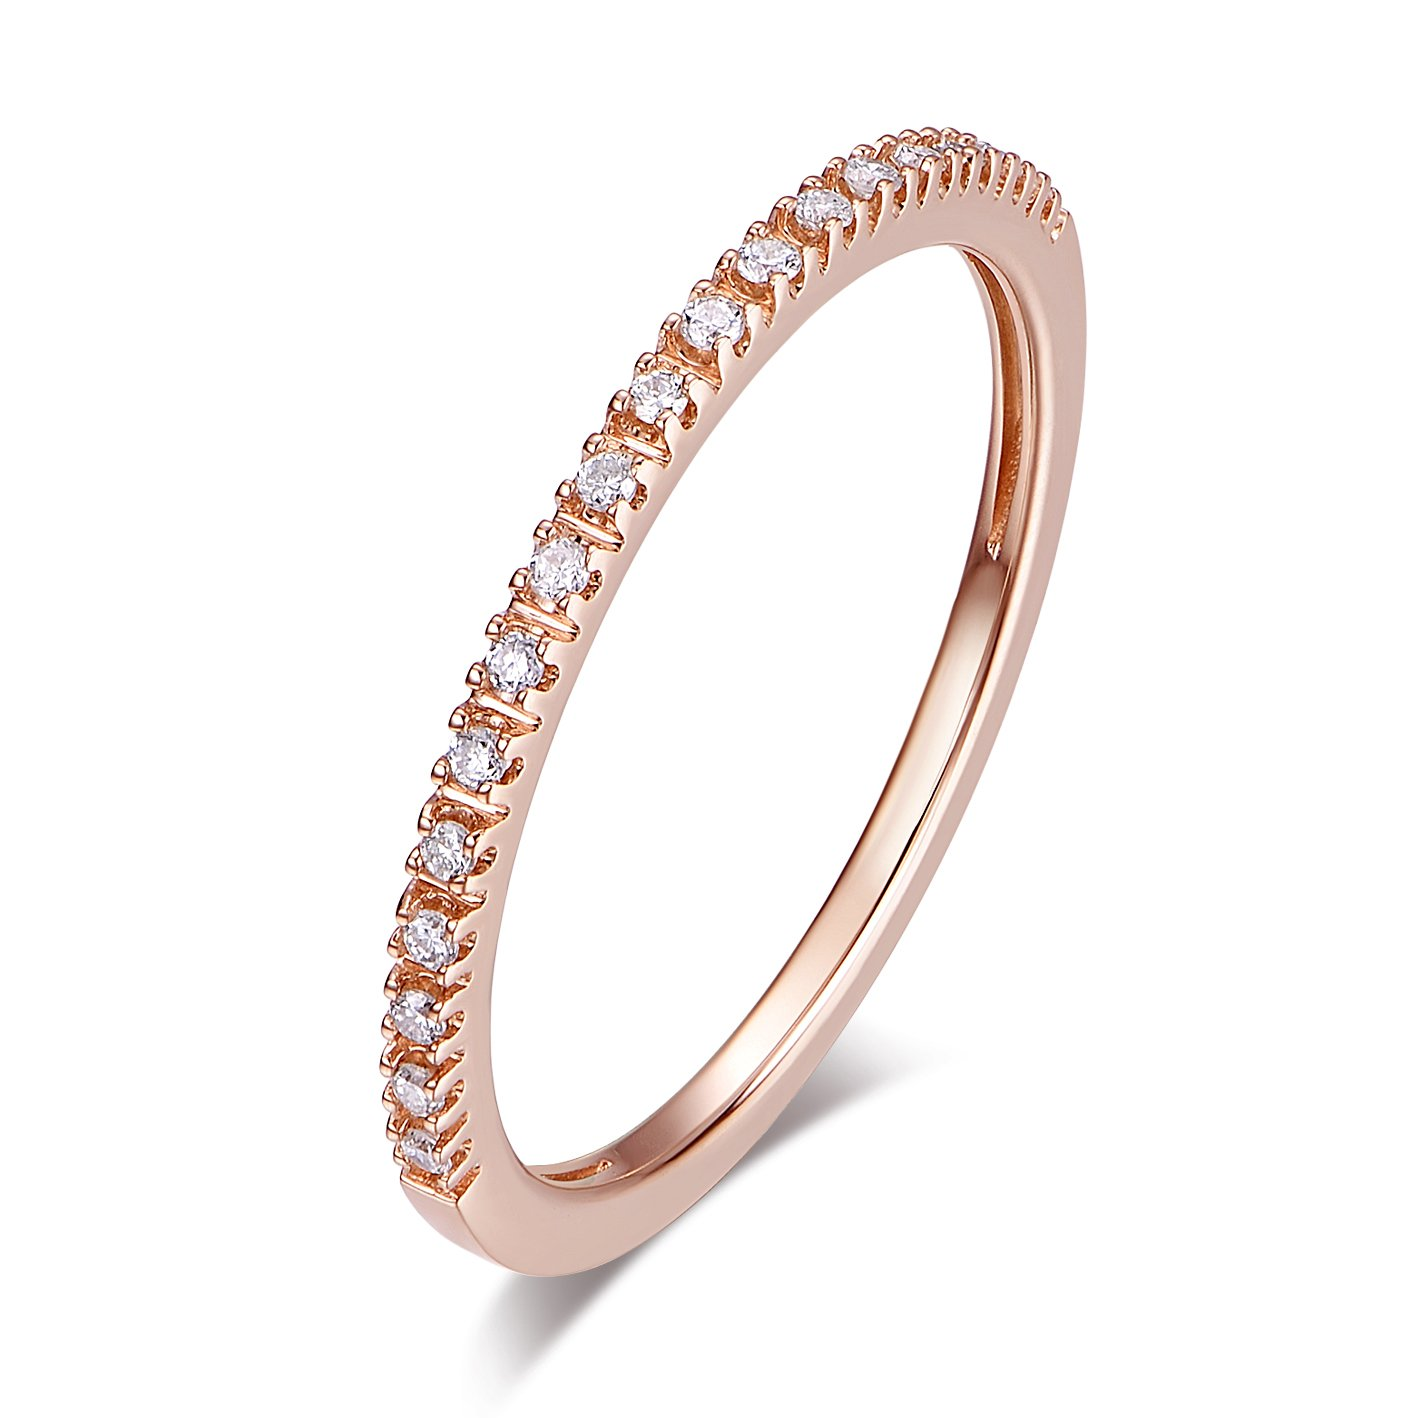 14K Gold Riviera Petite Micropave Diamond Half Eternity Wedding Band Ring for Women, 1.5mm Hafeez Center HCE1684